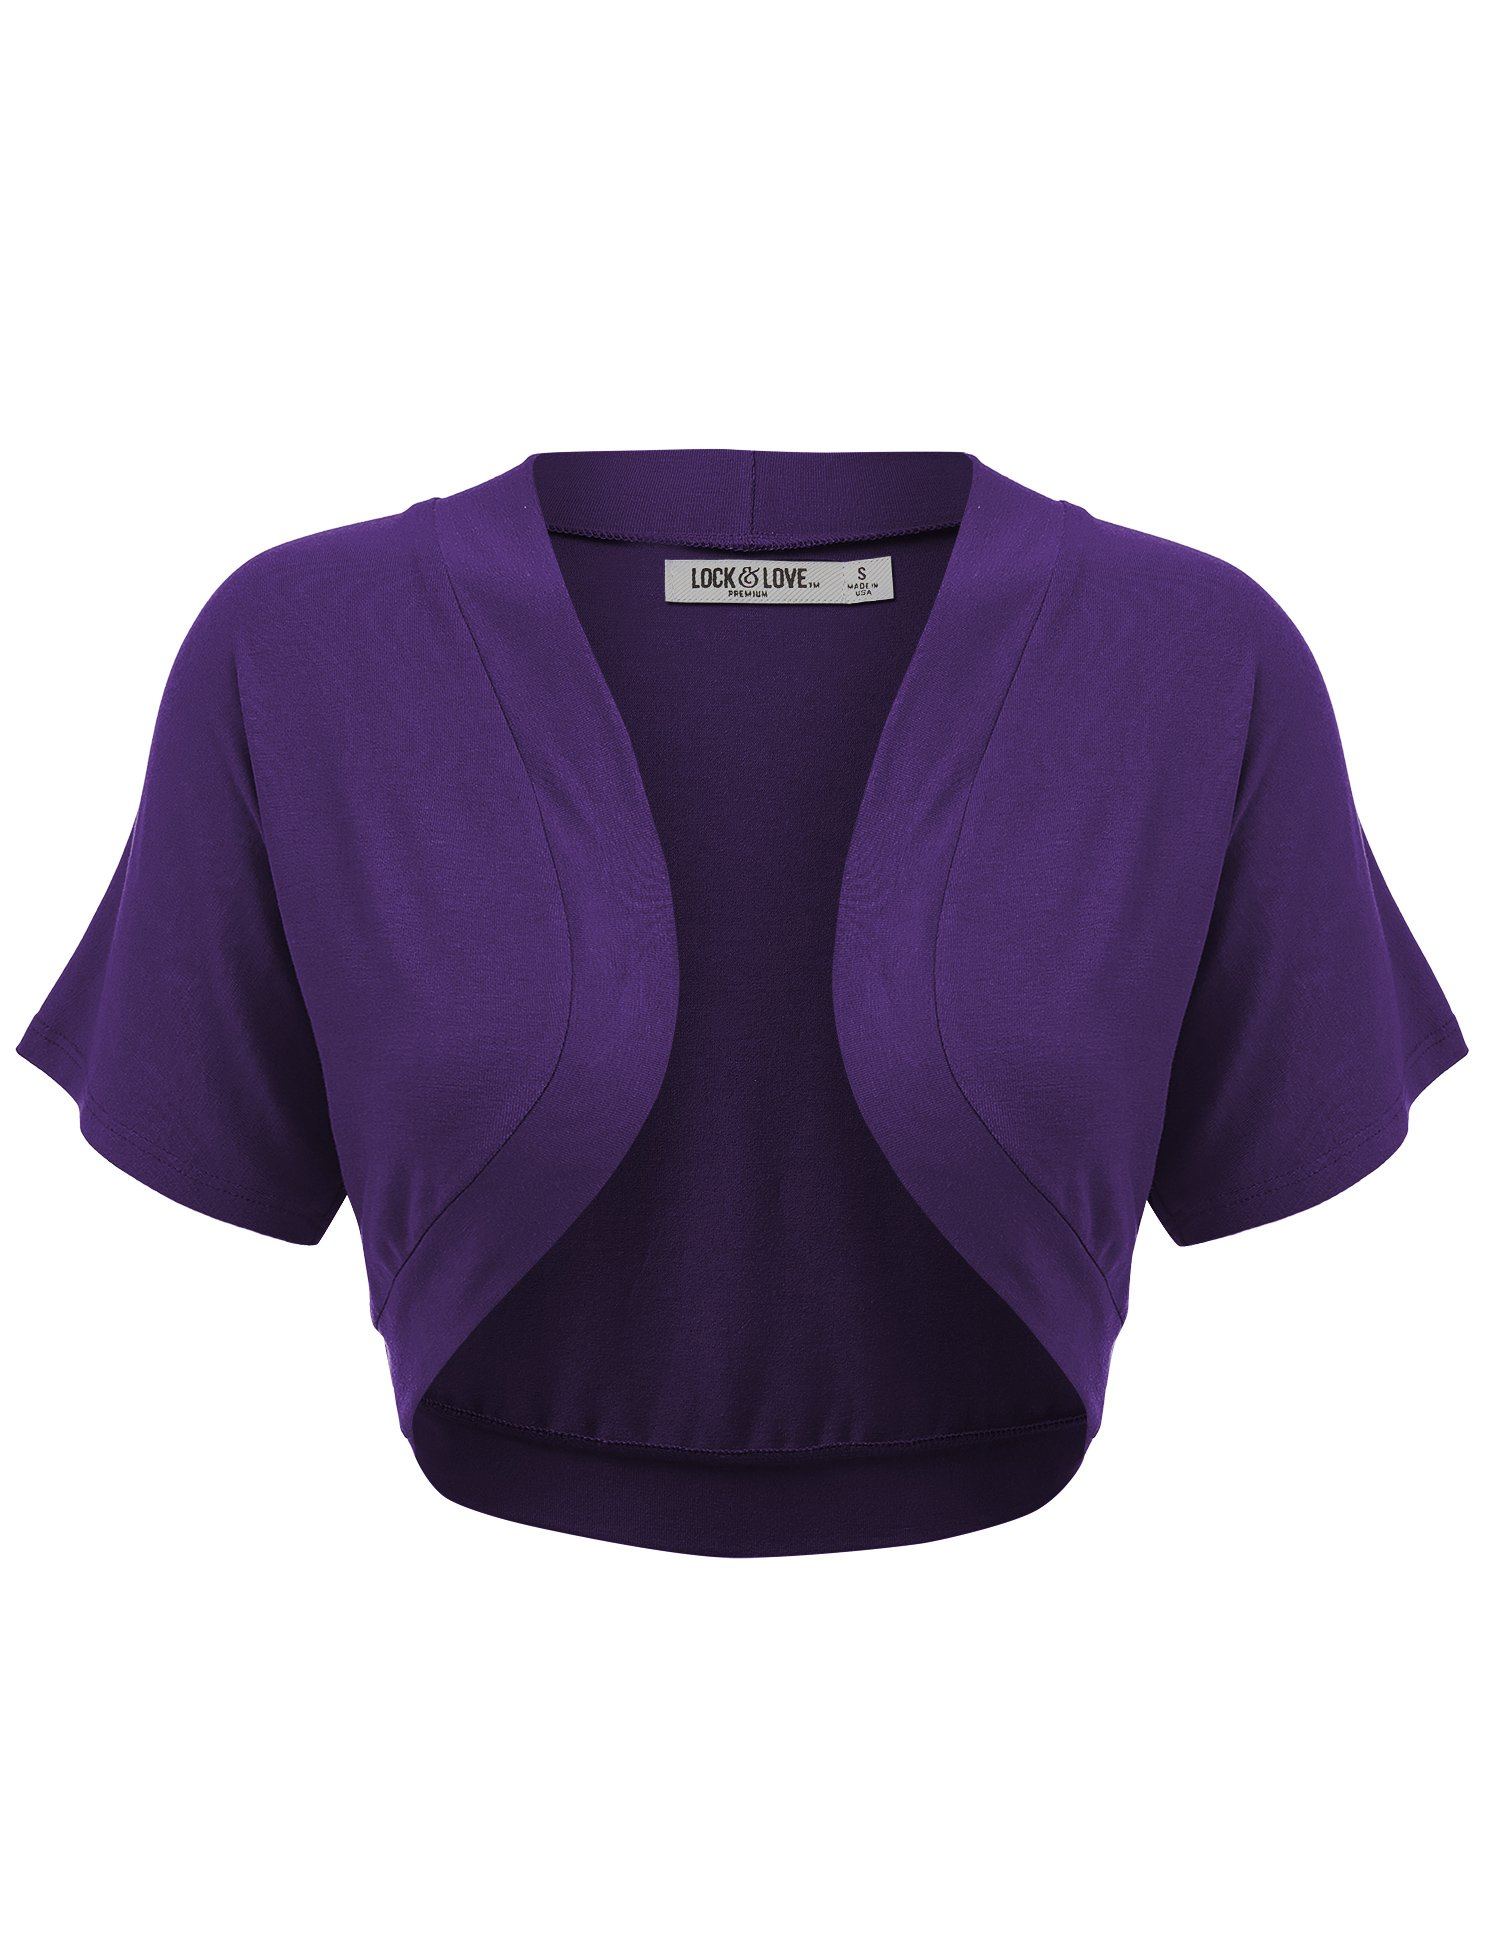 Lock and Love Women's Versatile Open Front Lightweight Short Sleeve Bolero Shrug